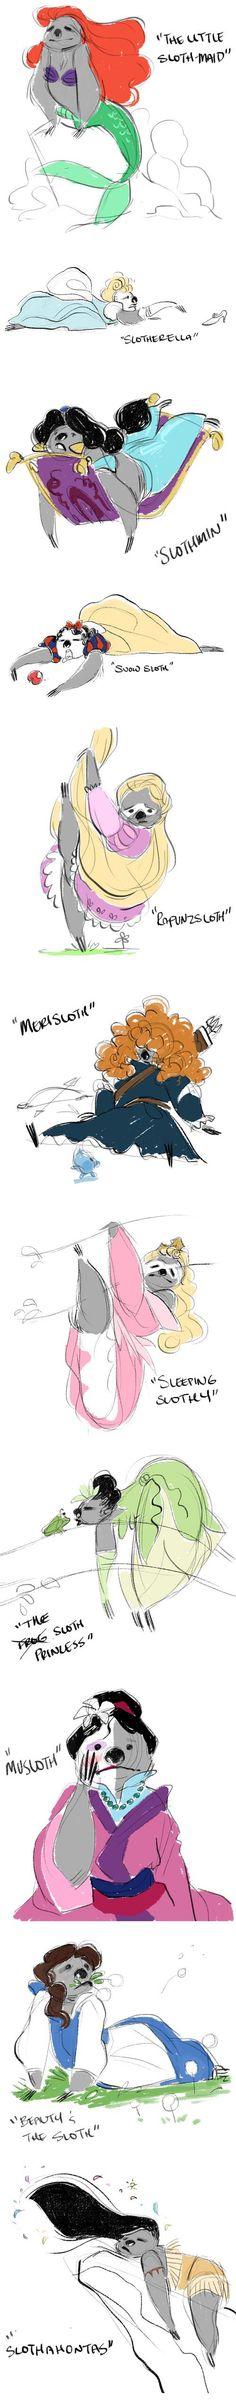 Disney Princesses as Sloths